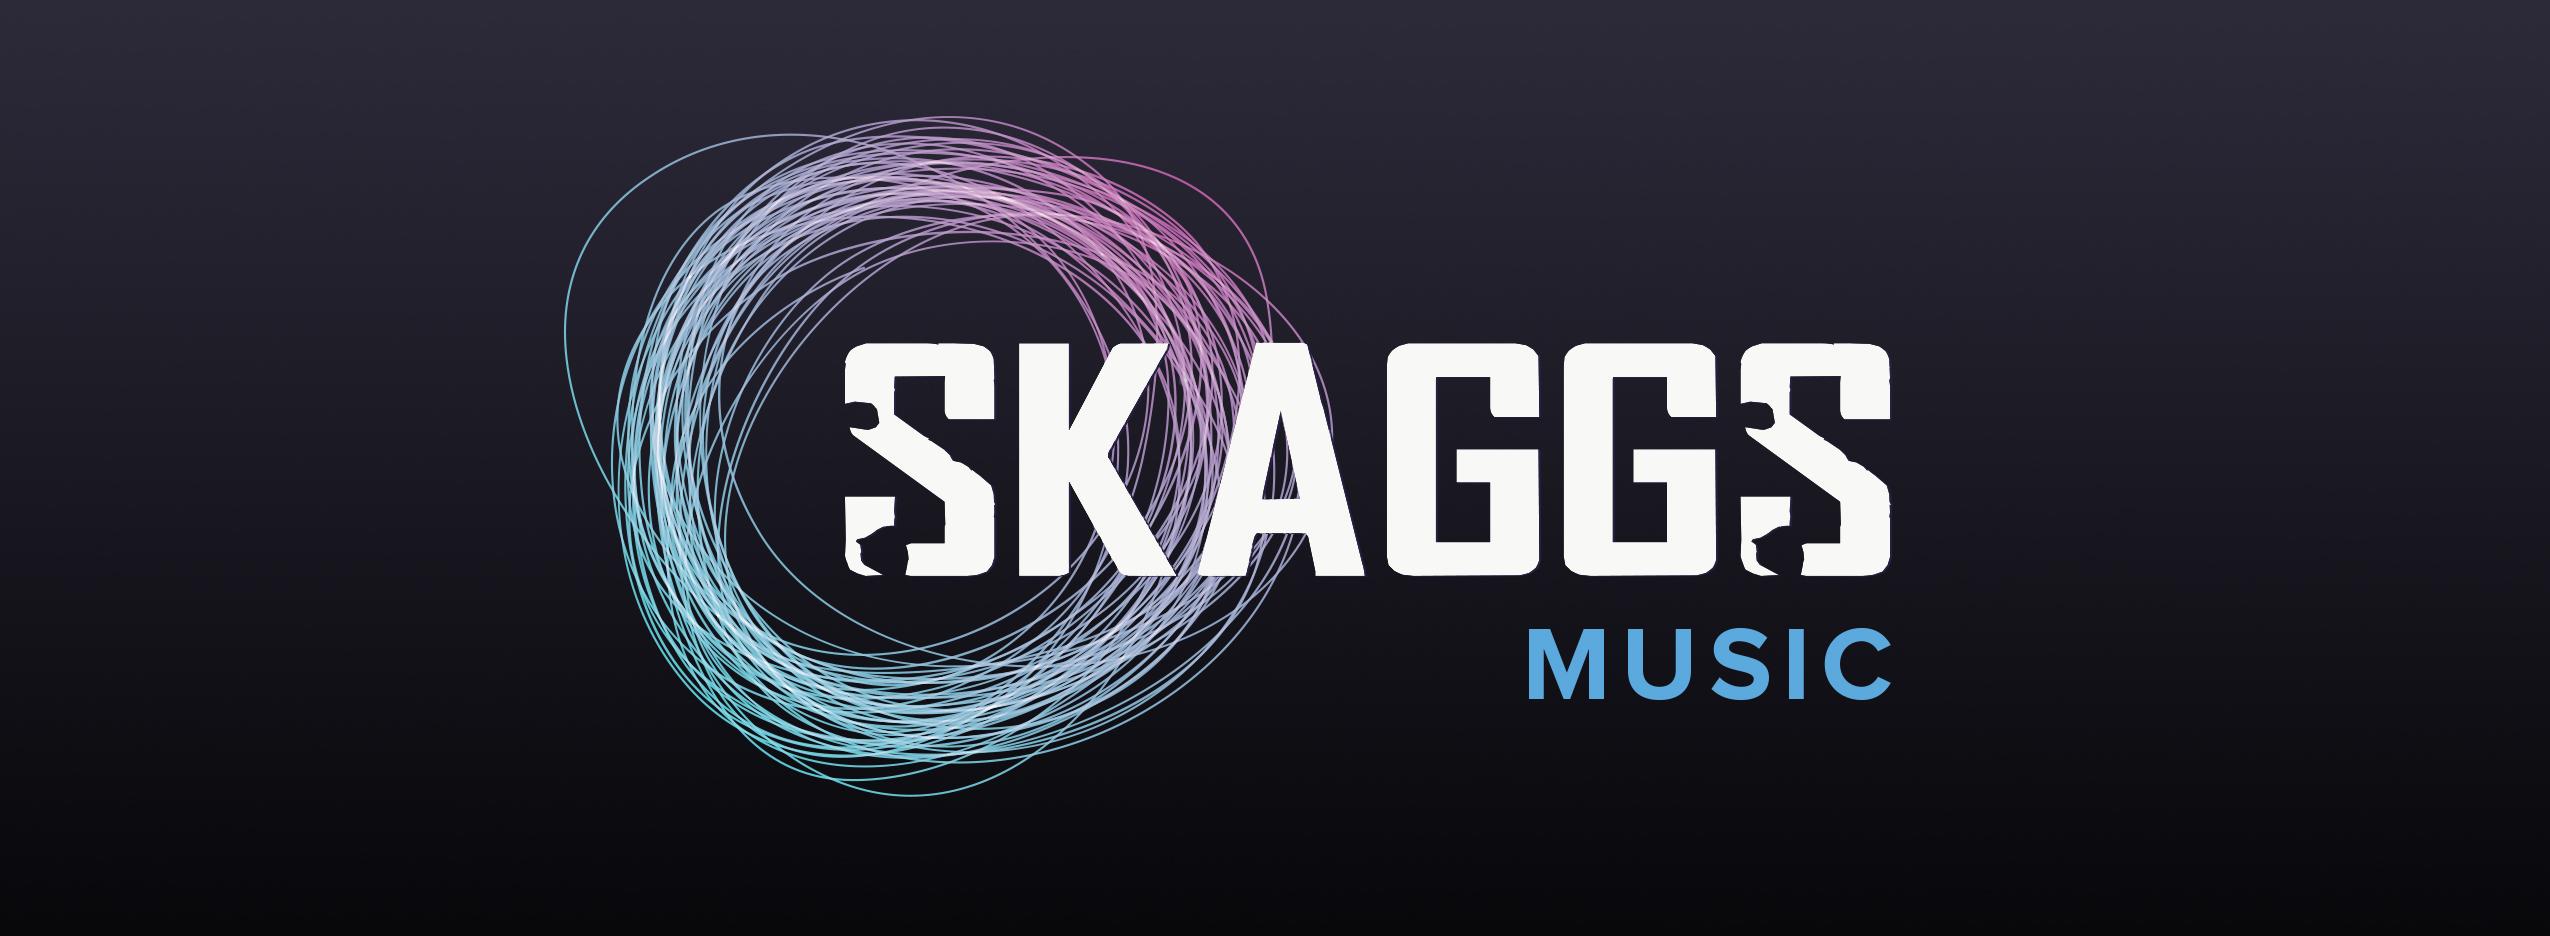 Skaggs_logo_-_large_edit